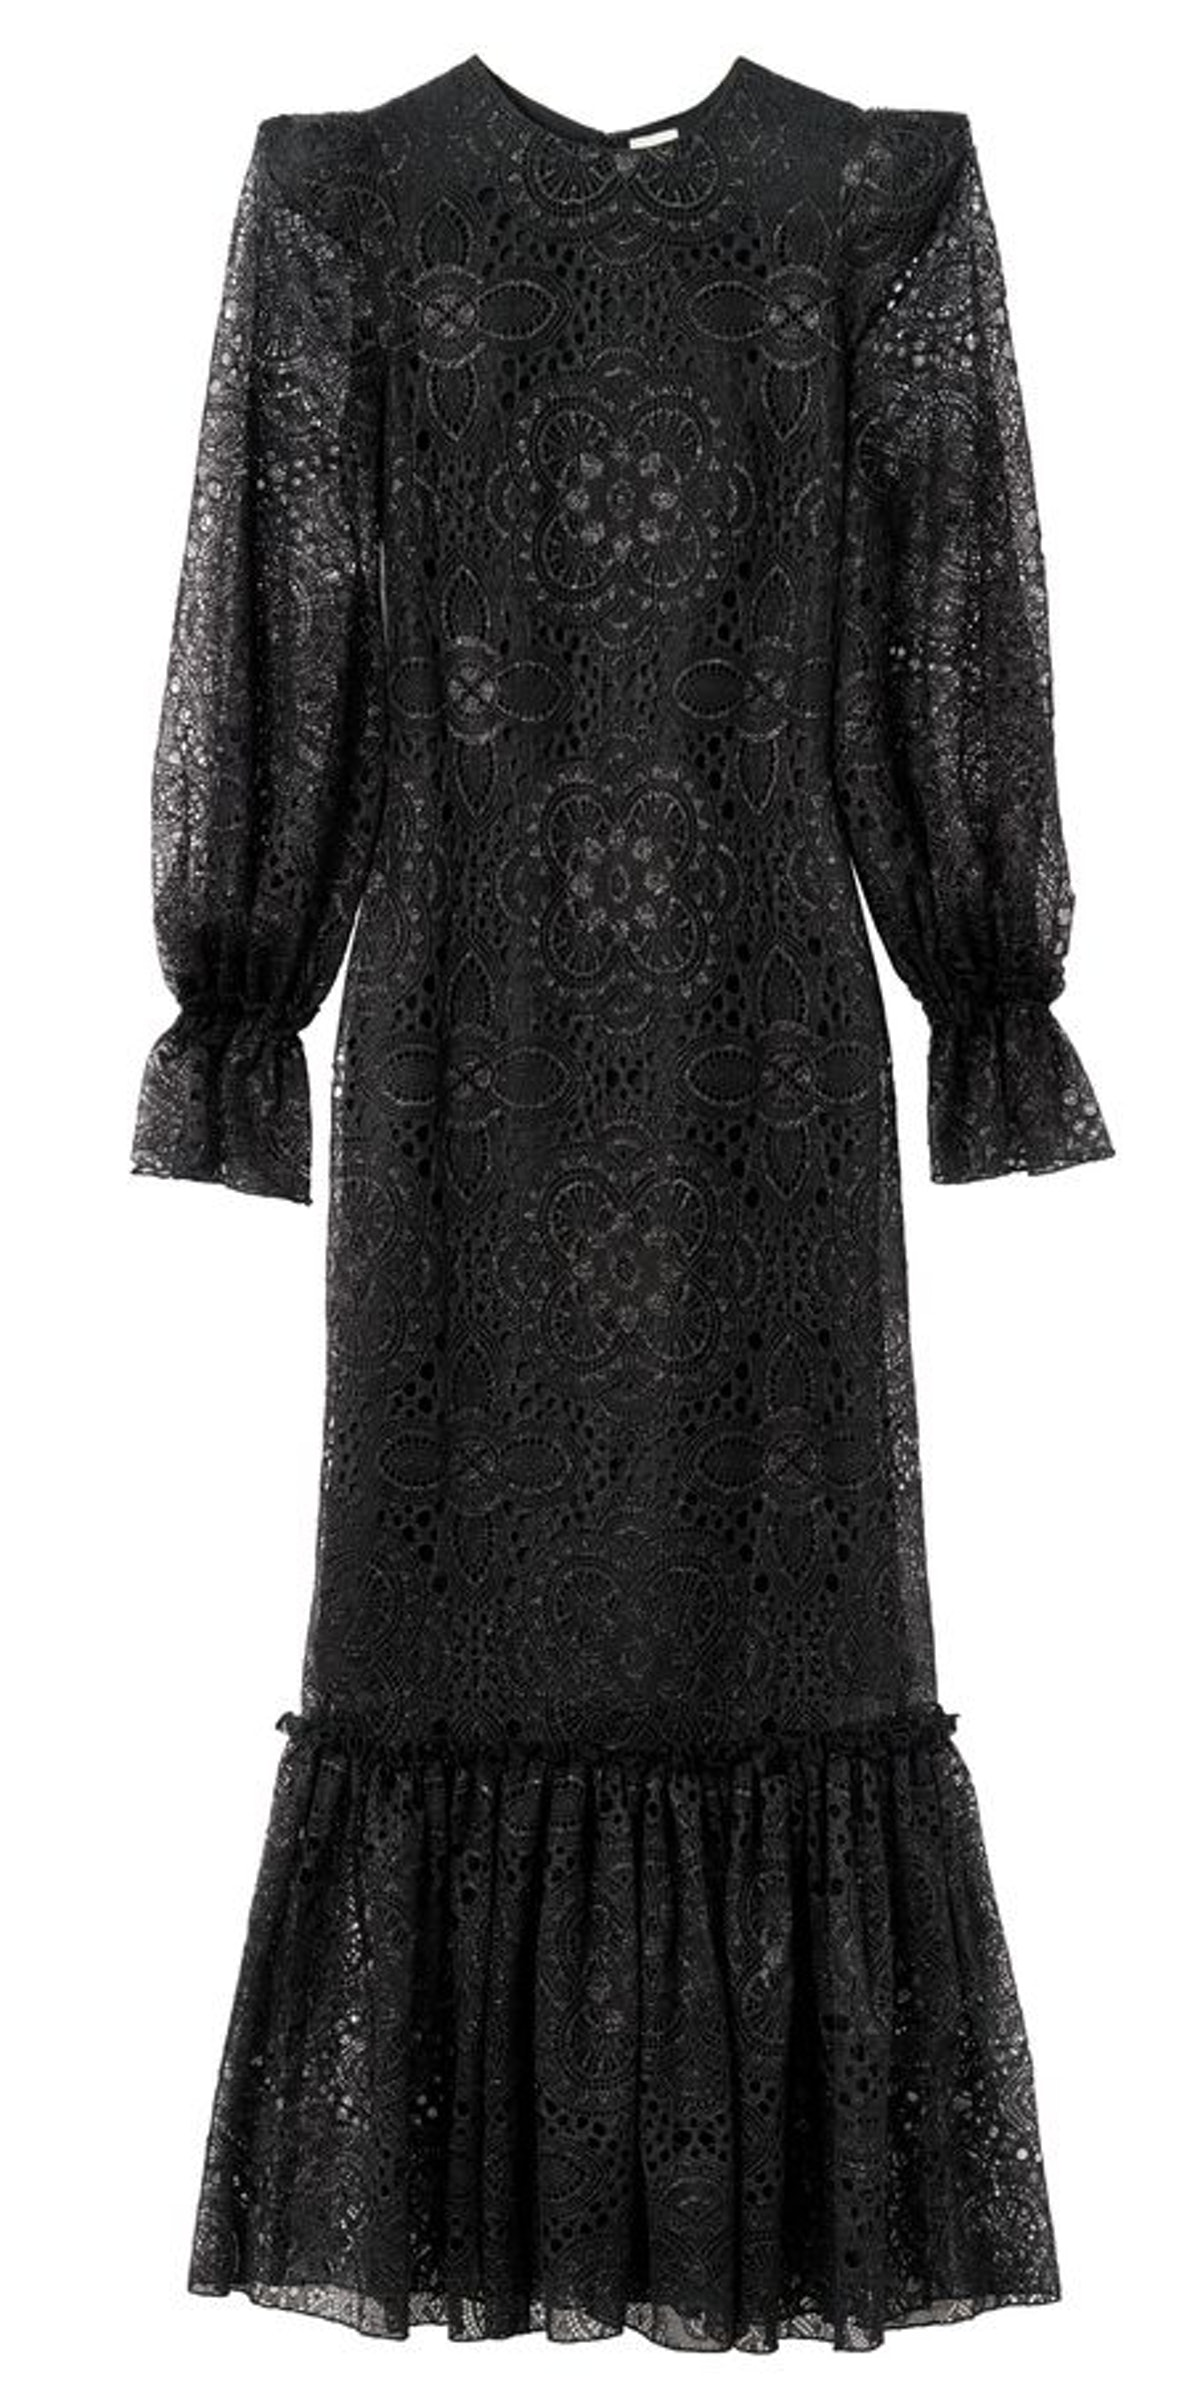 H&M x the Vampire's Wife Black Lace Maxi Dress